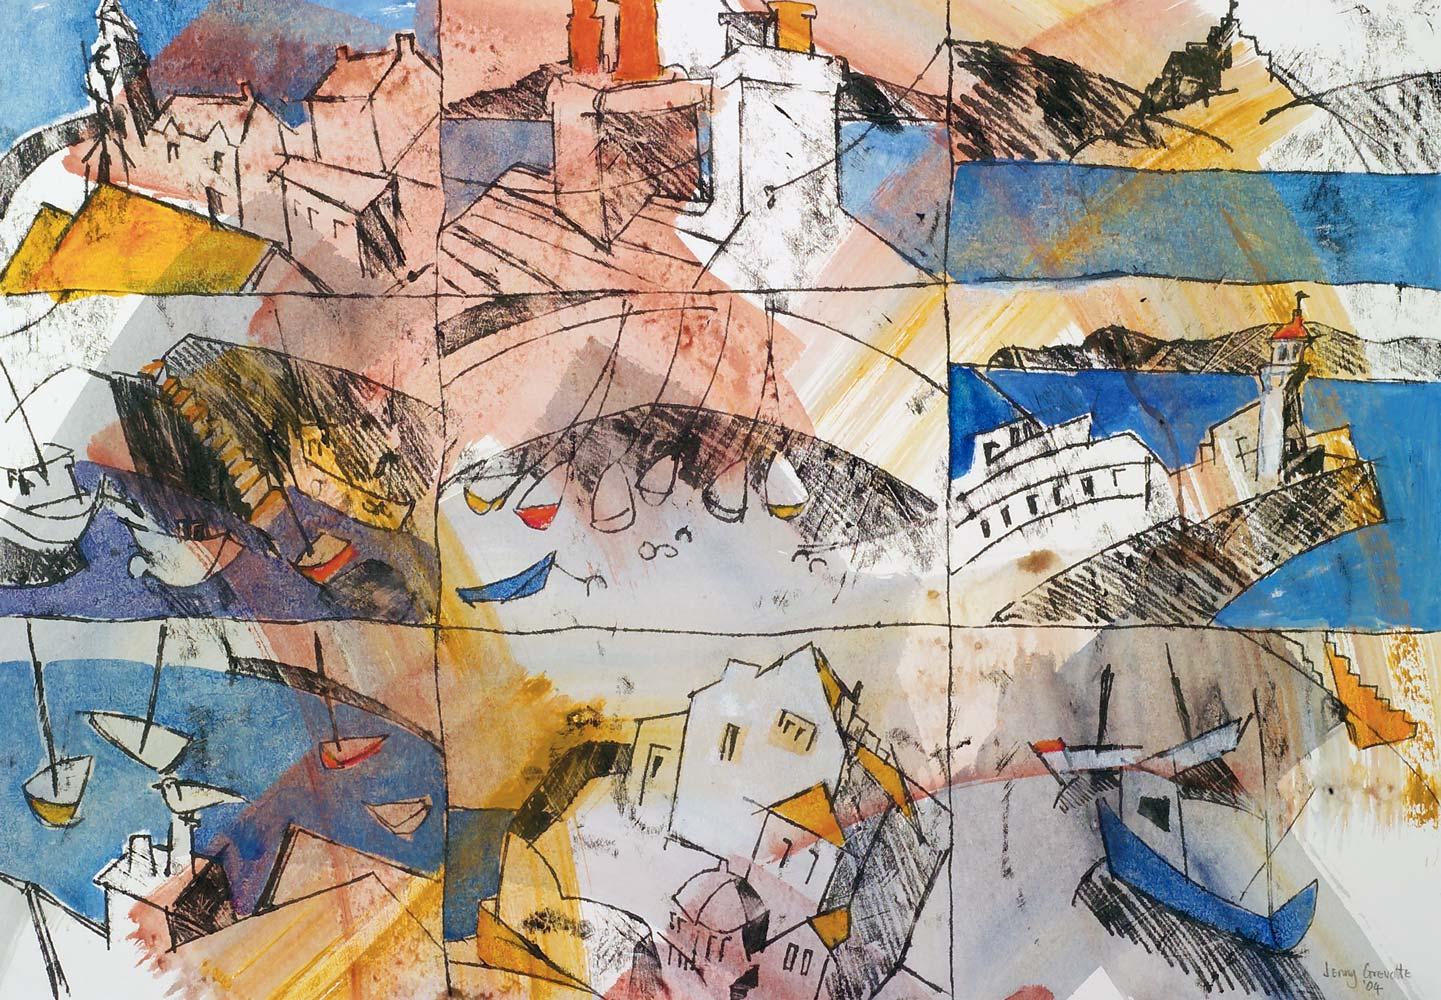 Fragments of Cornwall